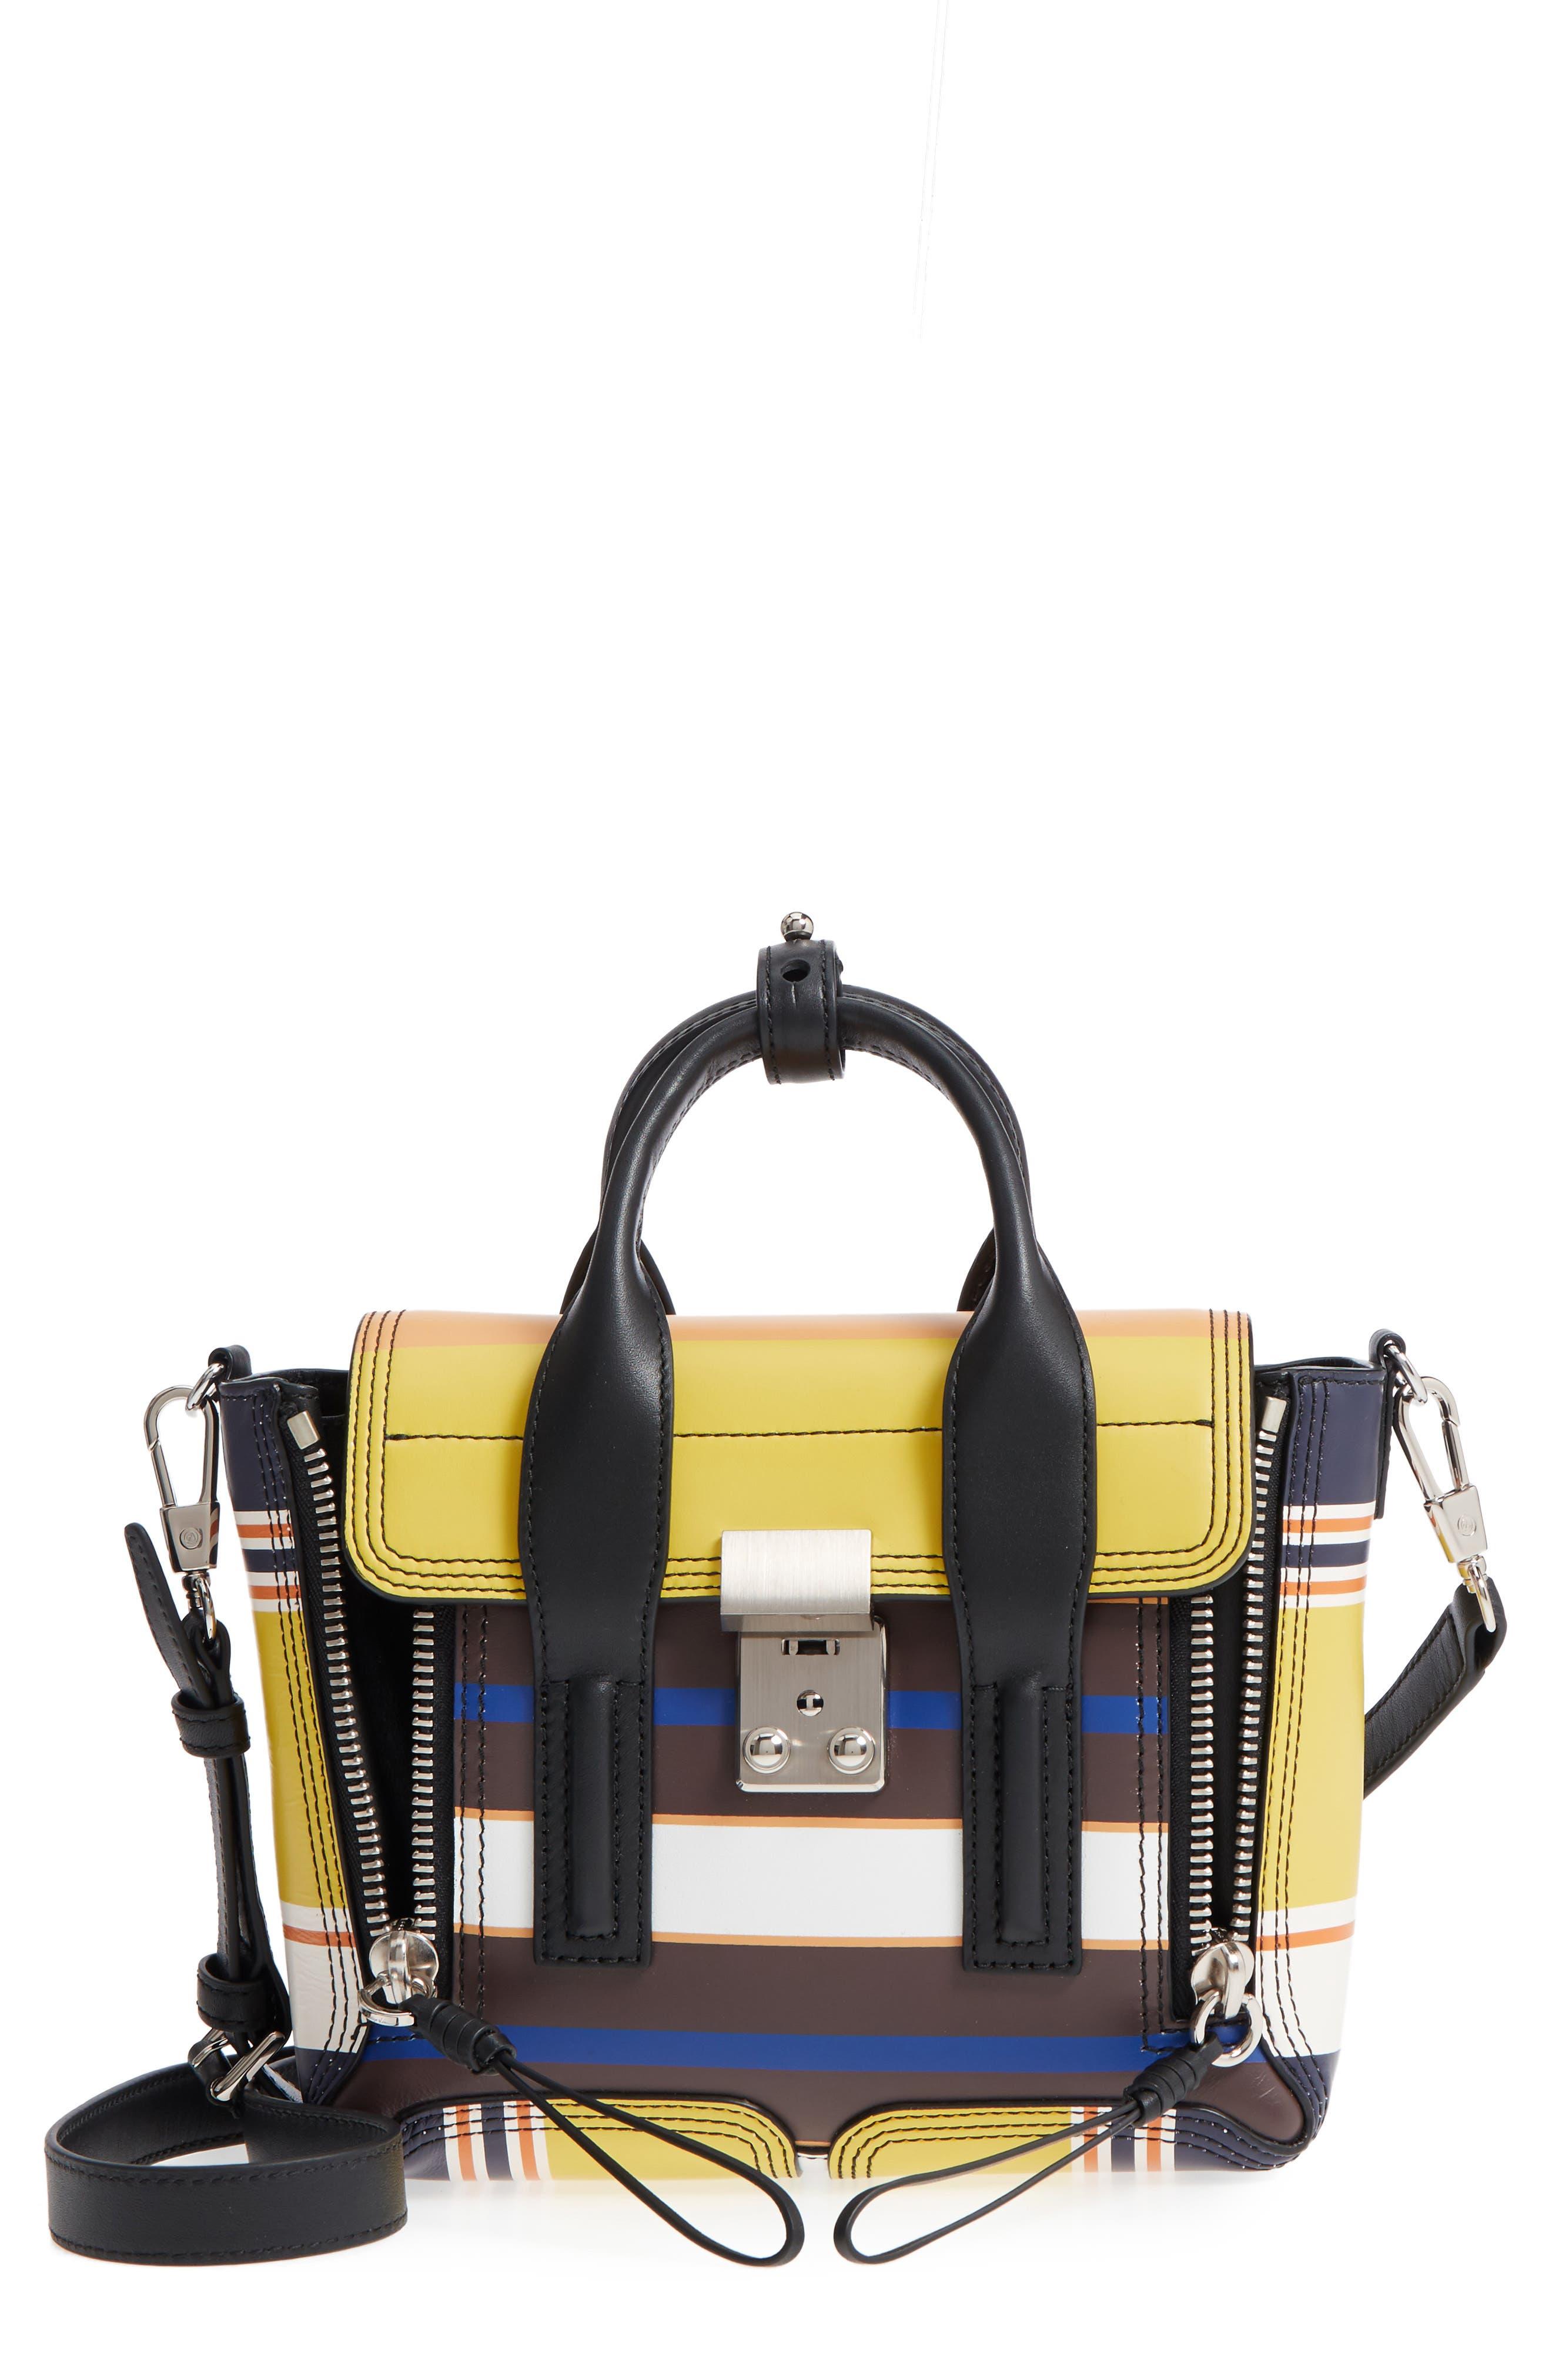 Alternate Image 1 Selected - 3.1 Phillip Lim Mini Pashli Stripe Leather Satchel